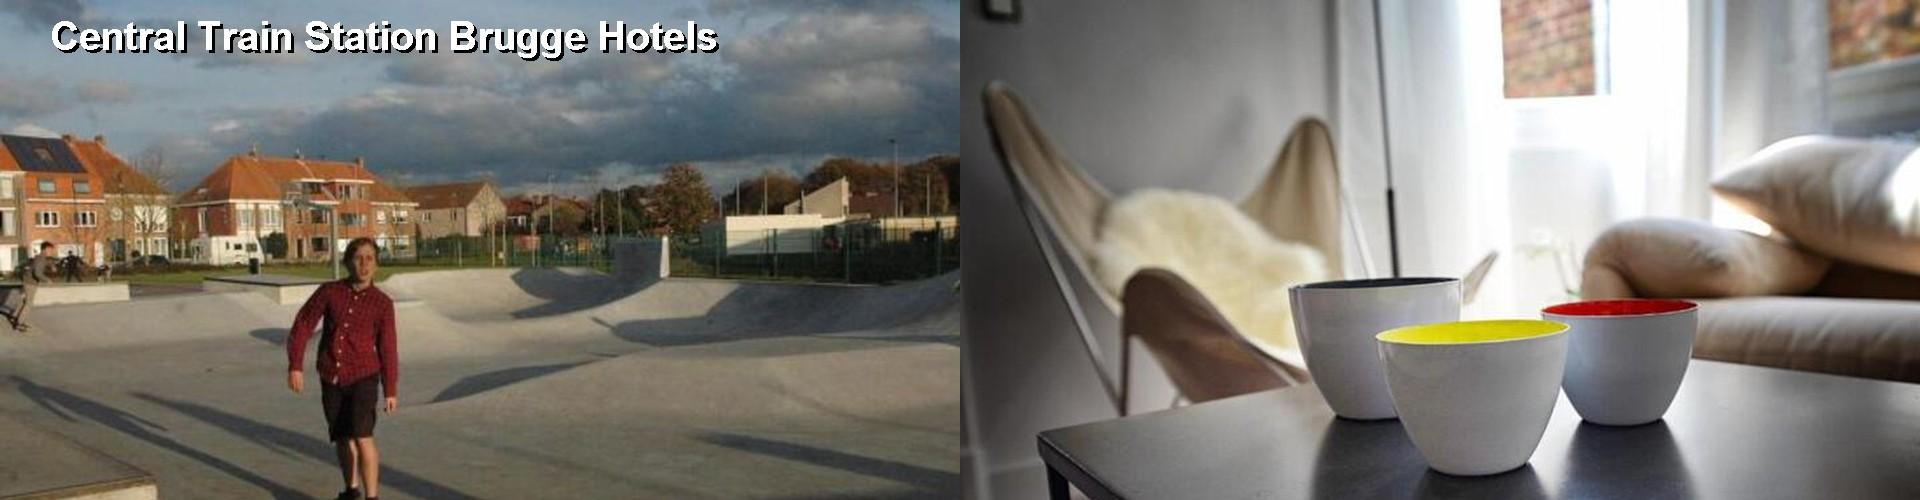 5 Best Hotels Near Central Train Station Brugge